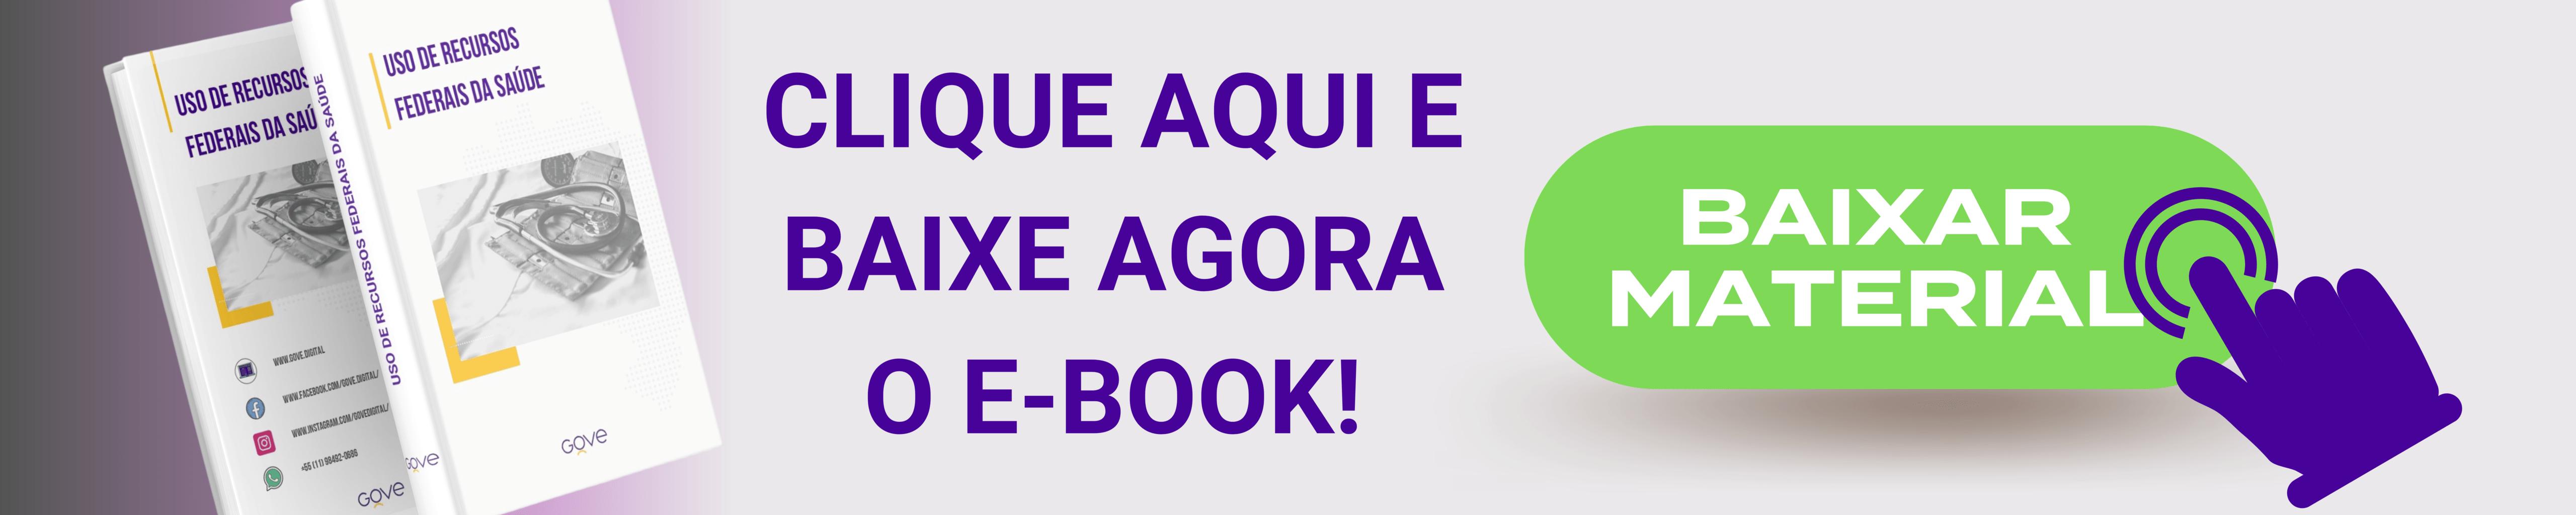 E-book da Saúde GOVE